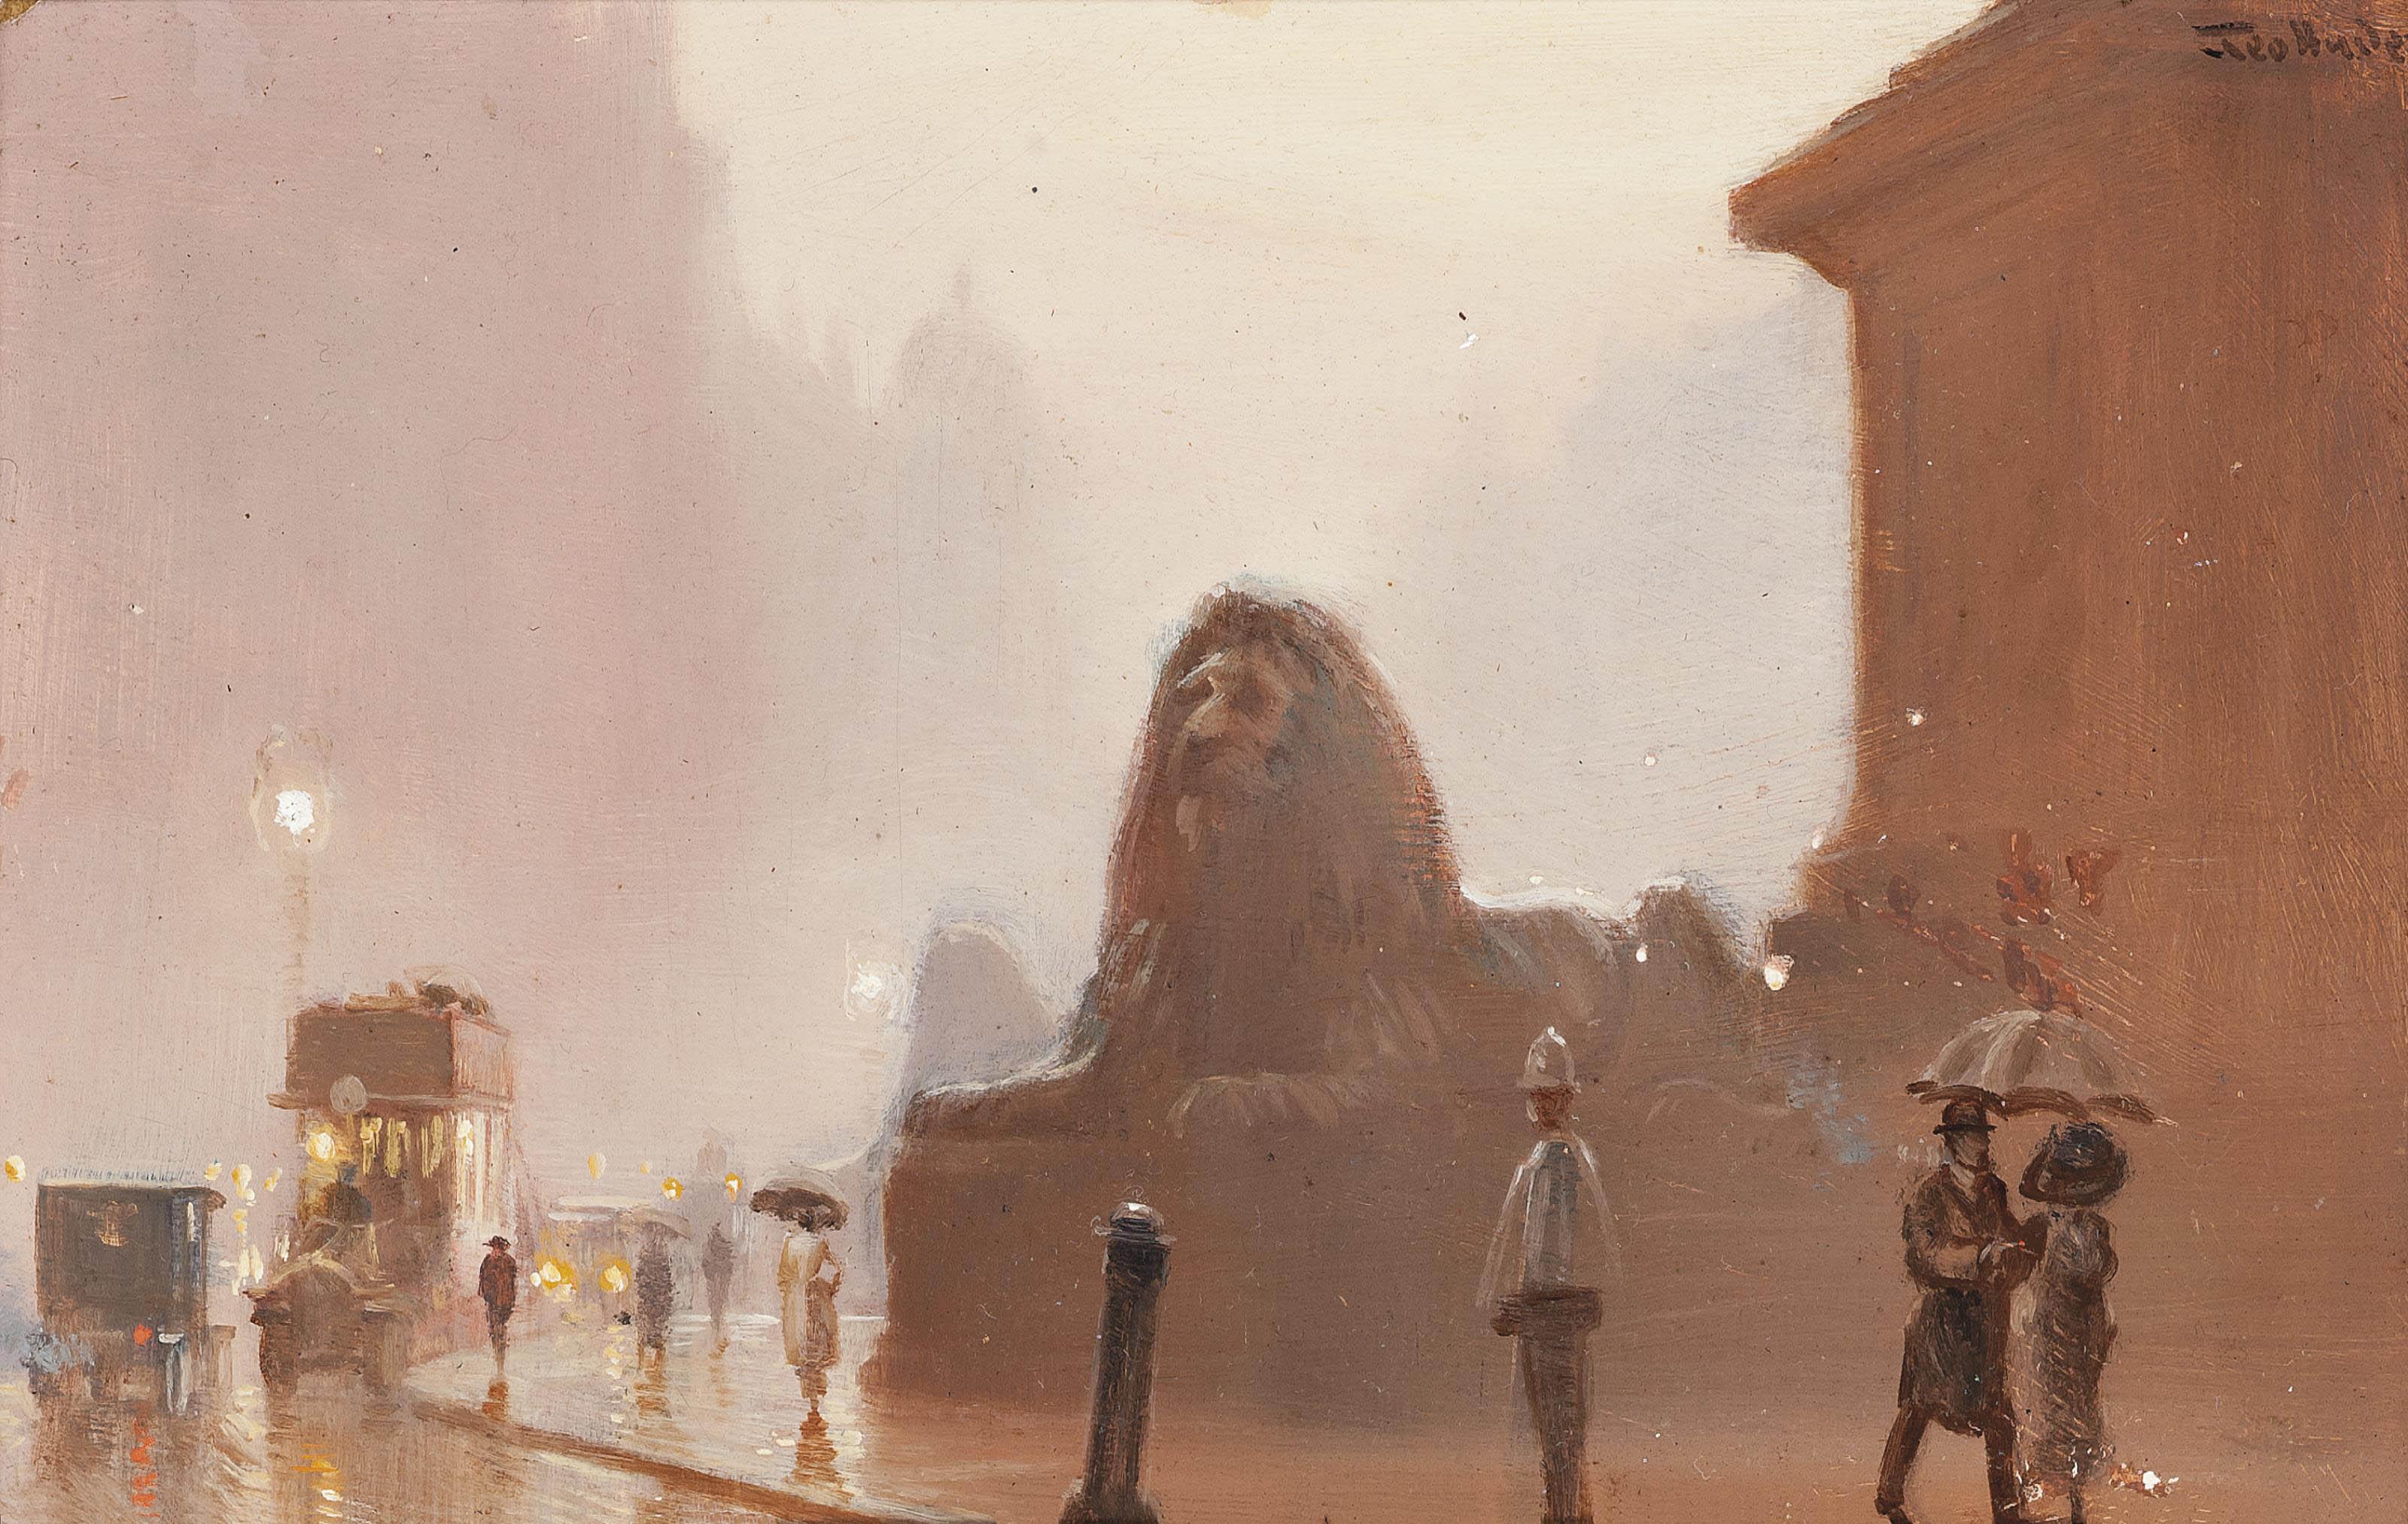 The British Lion, Trafalgar Square